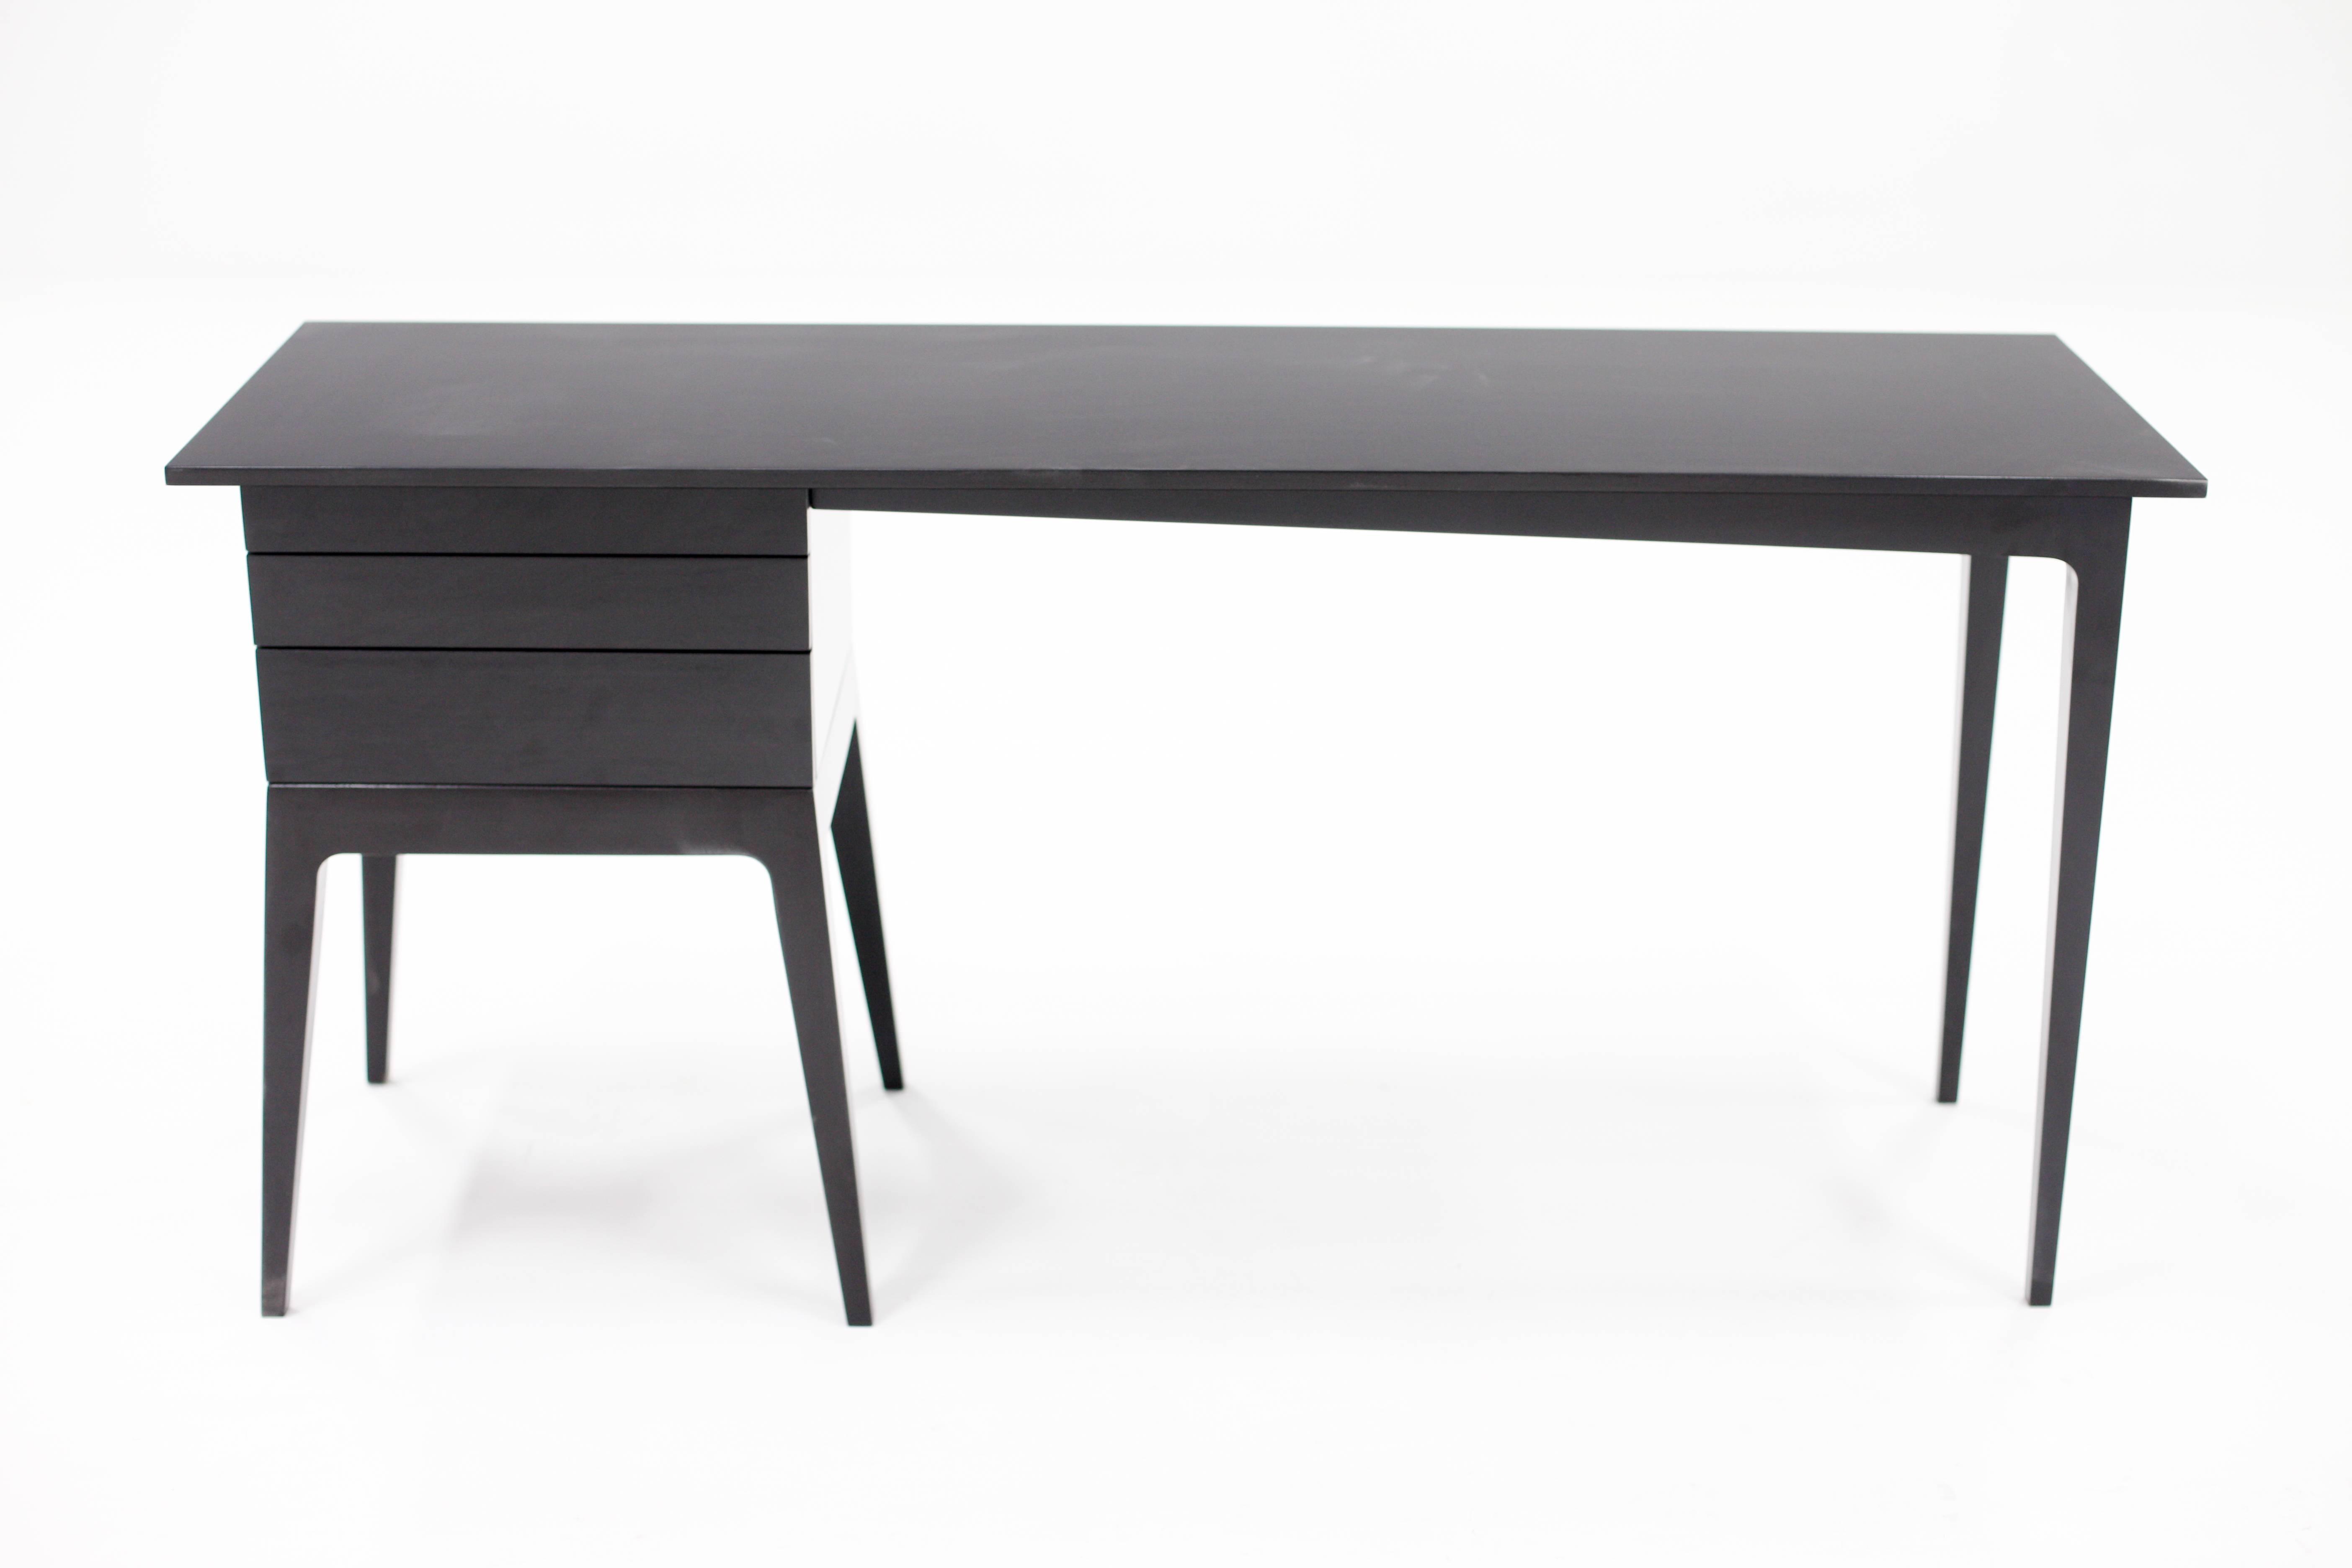 malabar wood writing desk minimalist contemporary mid century design rh 1stdibs com